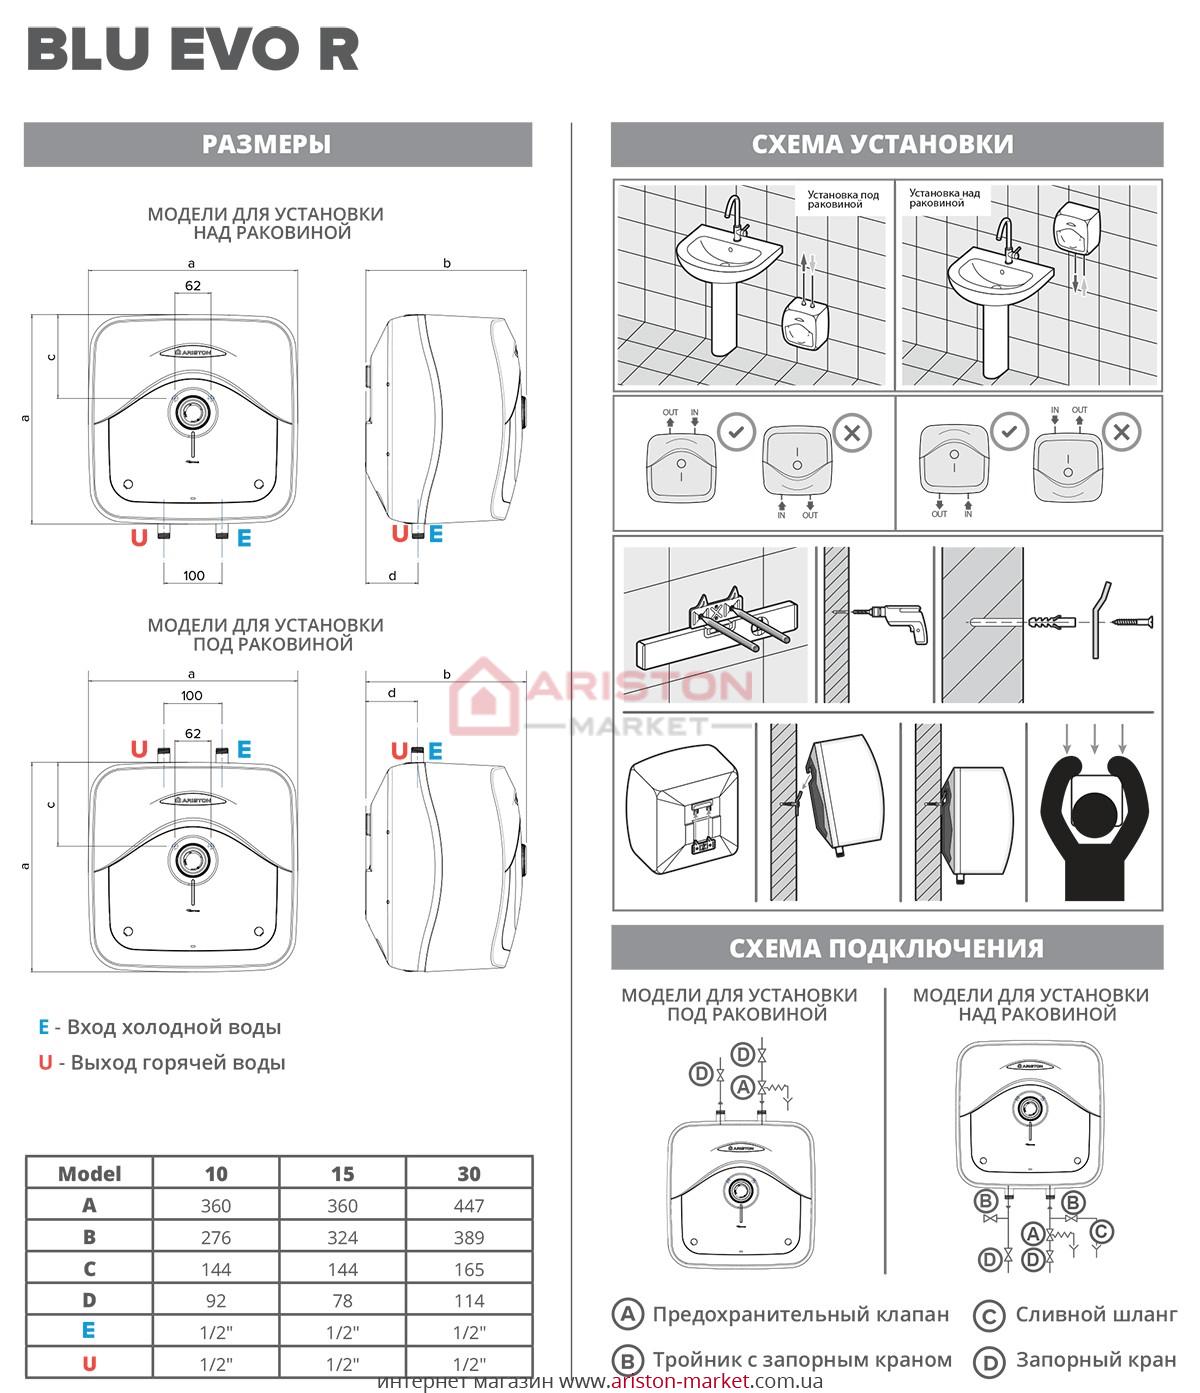 Ariston BLU Evo R 10/3 схема, габариты, чертеж